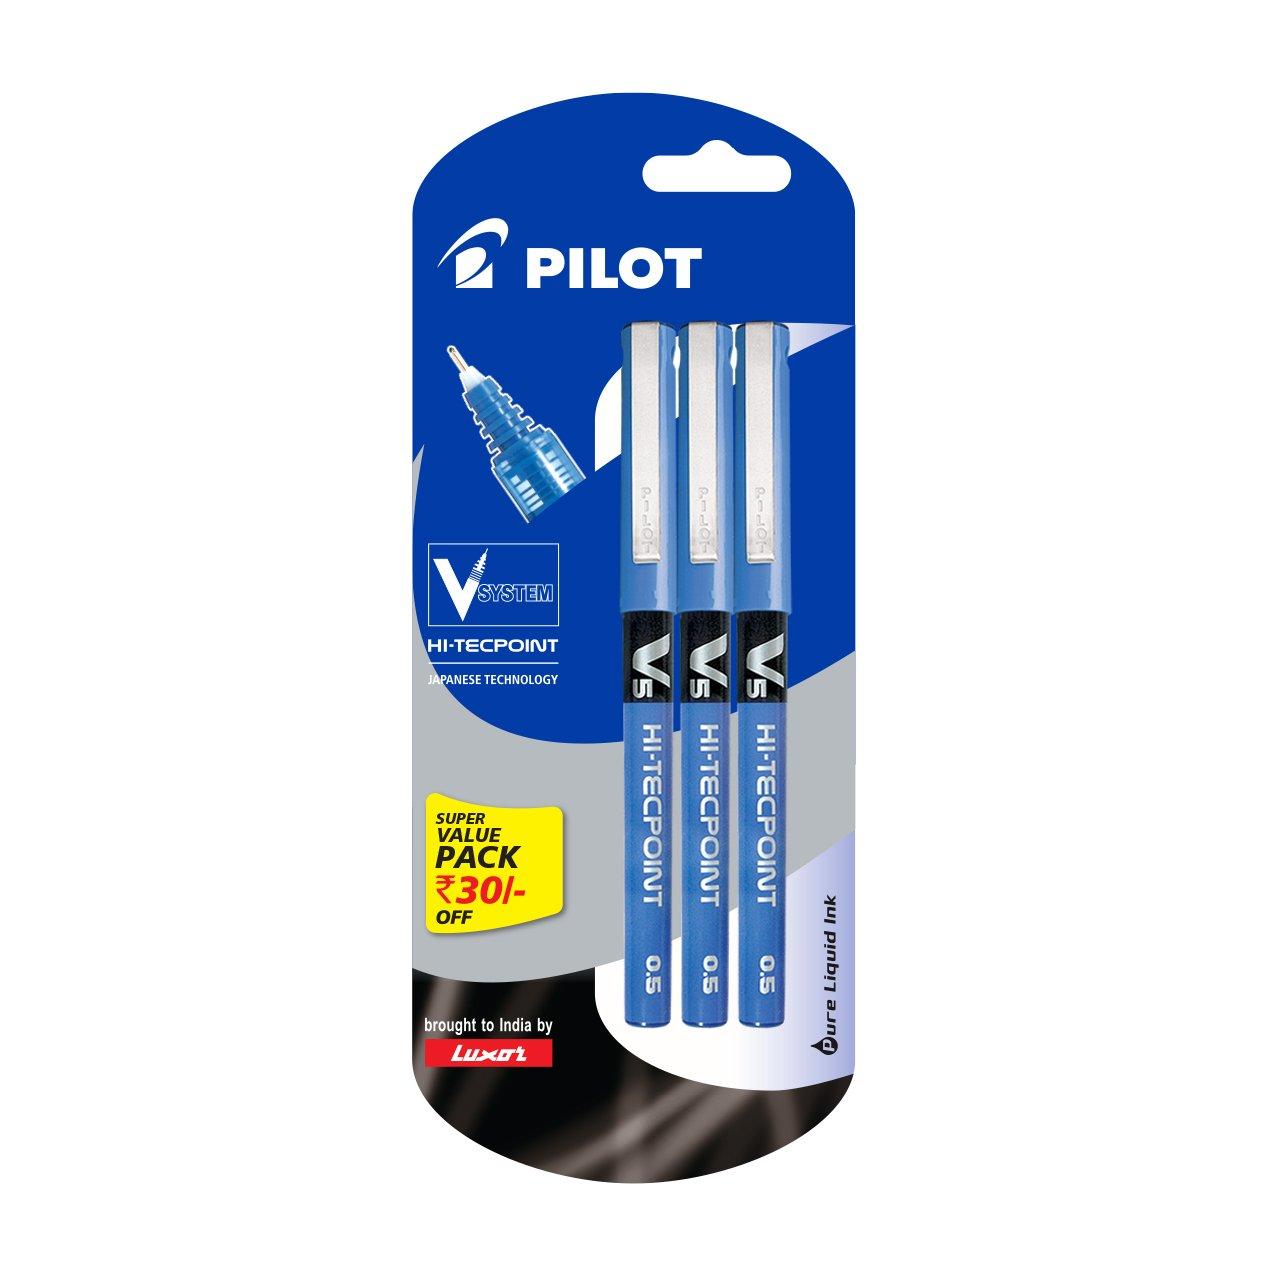 Pilot V5 Pen Liquid Ink Roller Ball Pen - Pack of 3, Blue